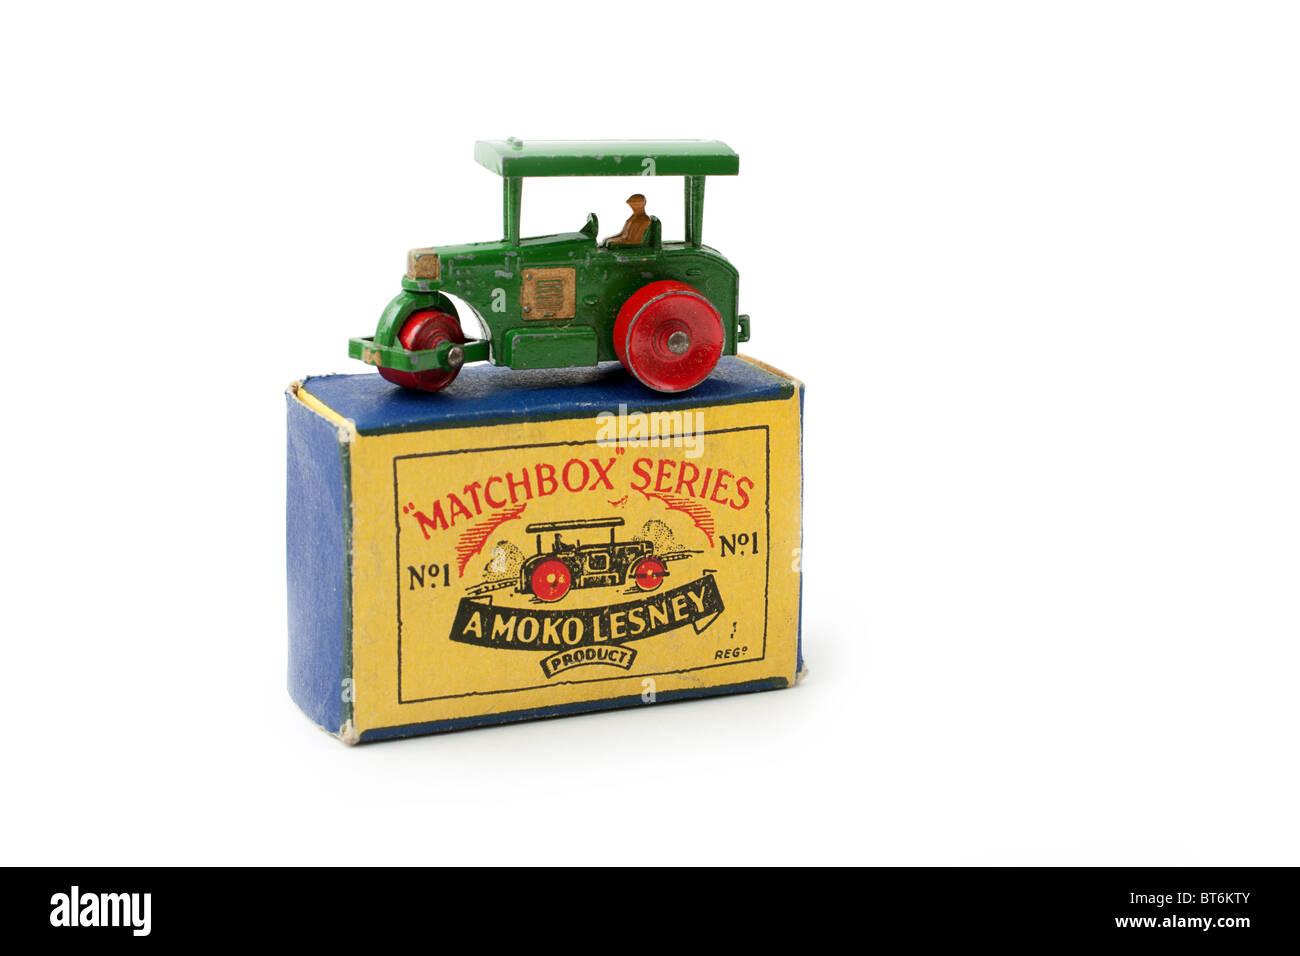 matchbox 1-75 die cast car, mint in box,steamroller - Stock Image